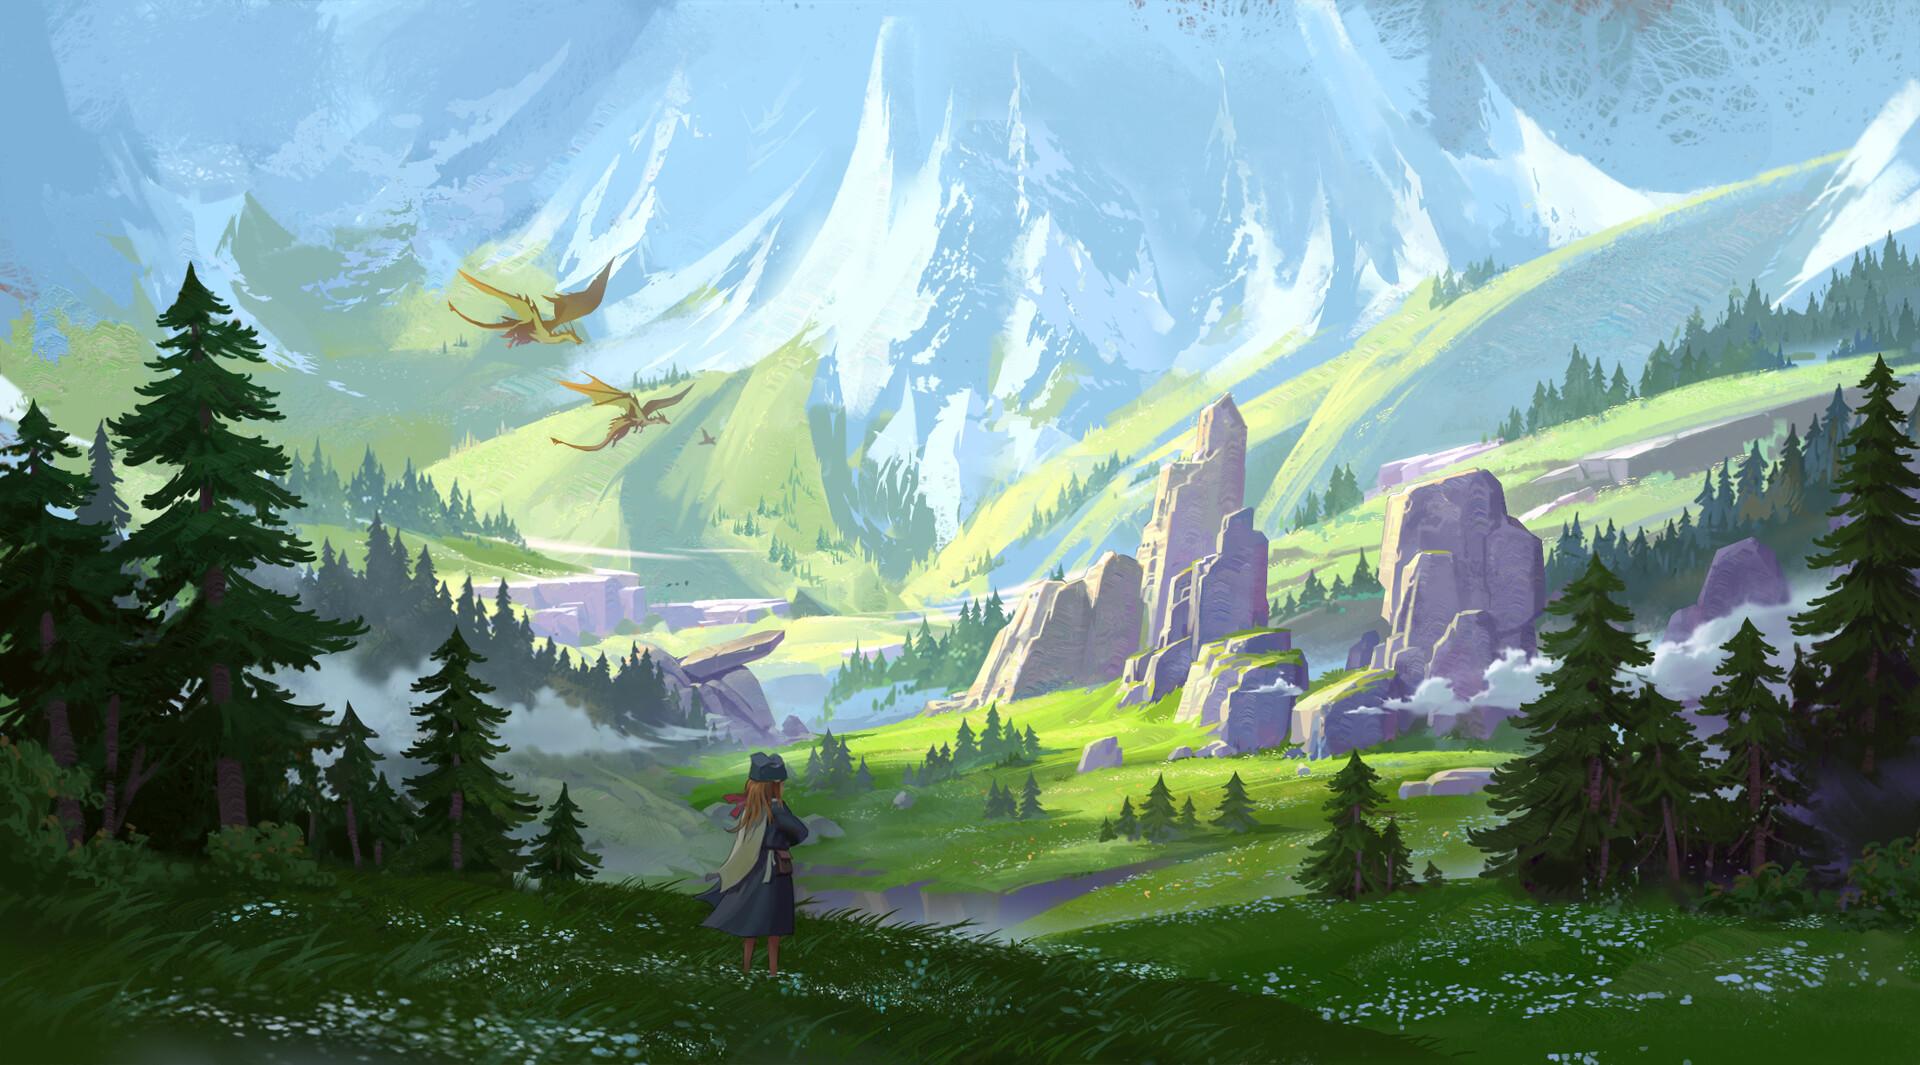 General 1920x1065 MH C digital art fantasy art mountains forest dragon flowers women